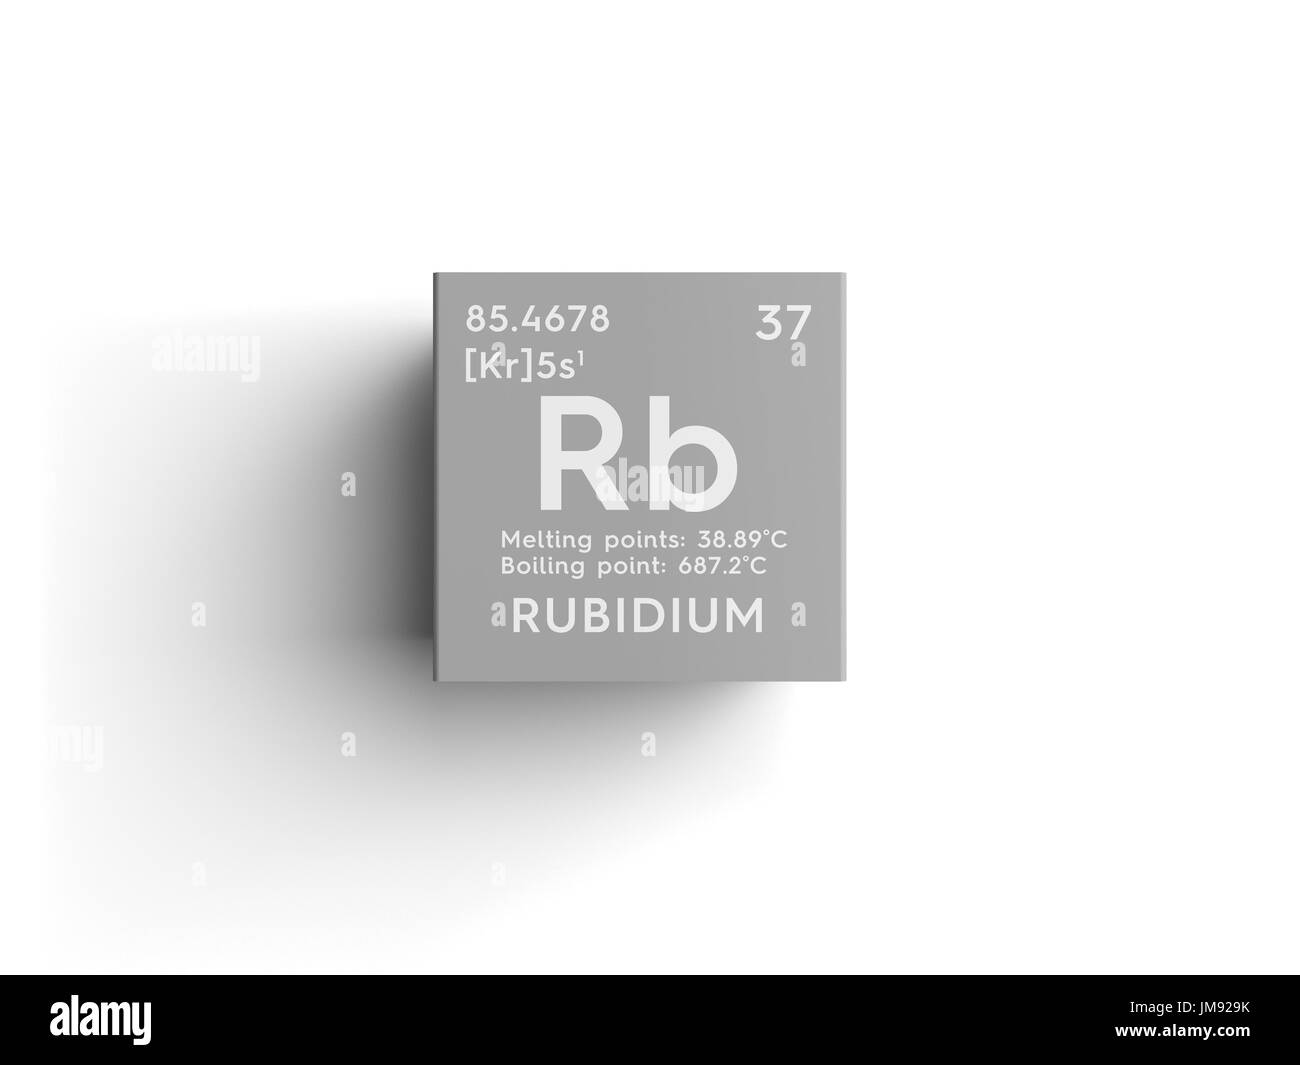 Rubidium alkali metals chemical element of mendeleevs periodic alkali metals chemical element of mendeleevs periodic table rubidium in square cube creative concept urtaz Image collections